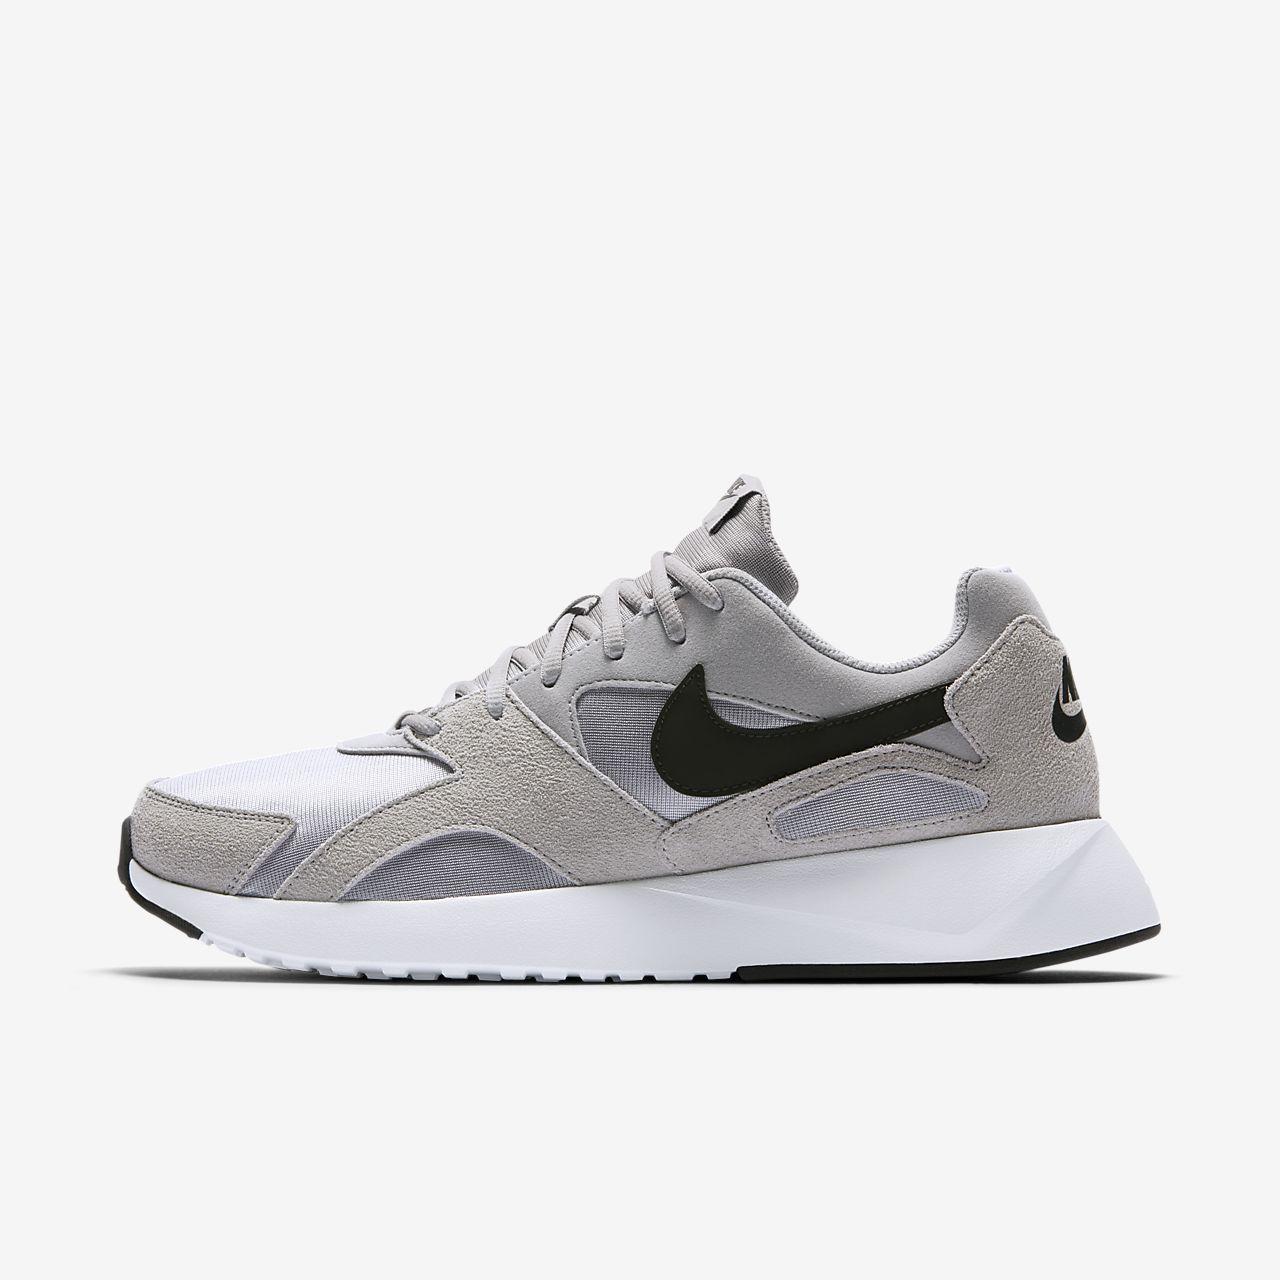 new concept 878e6 38639 Nike Pantheos Scarpa nero bianco Gran Venta Alta Calidad Barata G5sabWg9